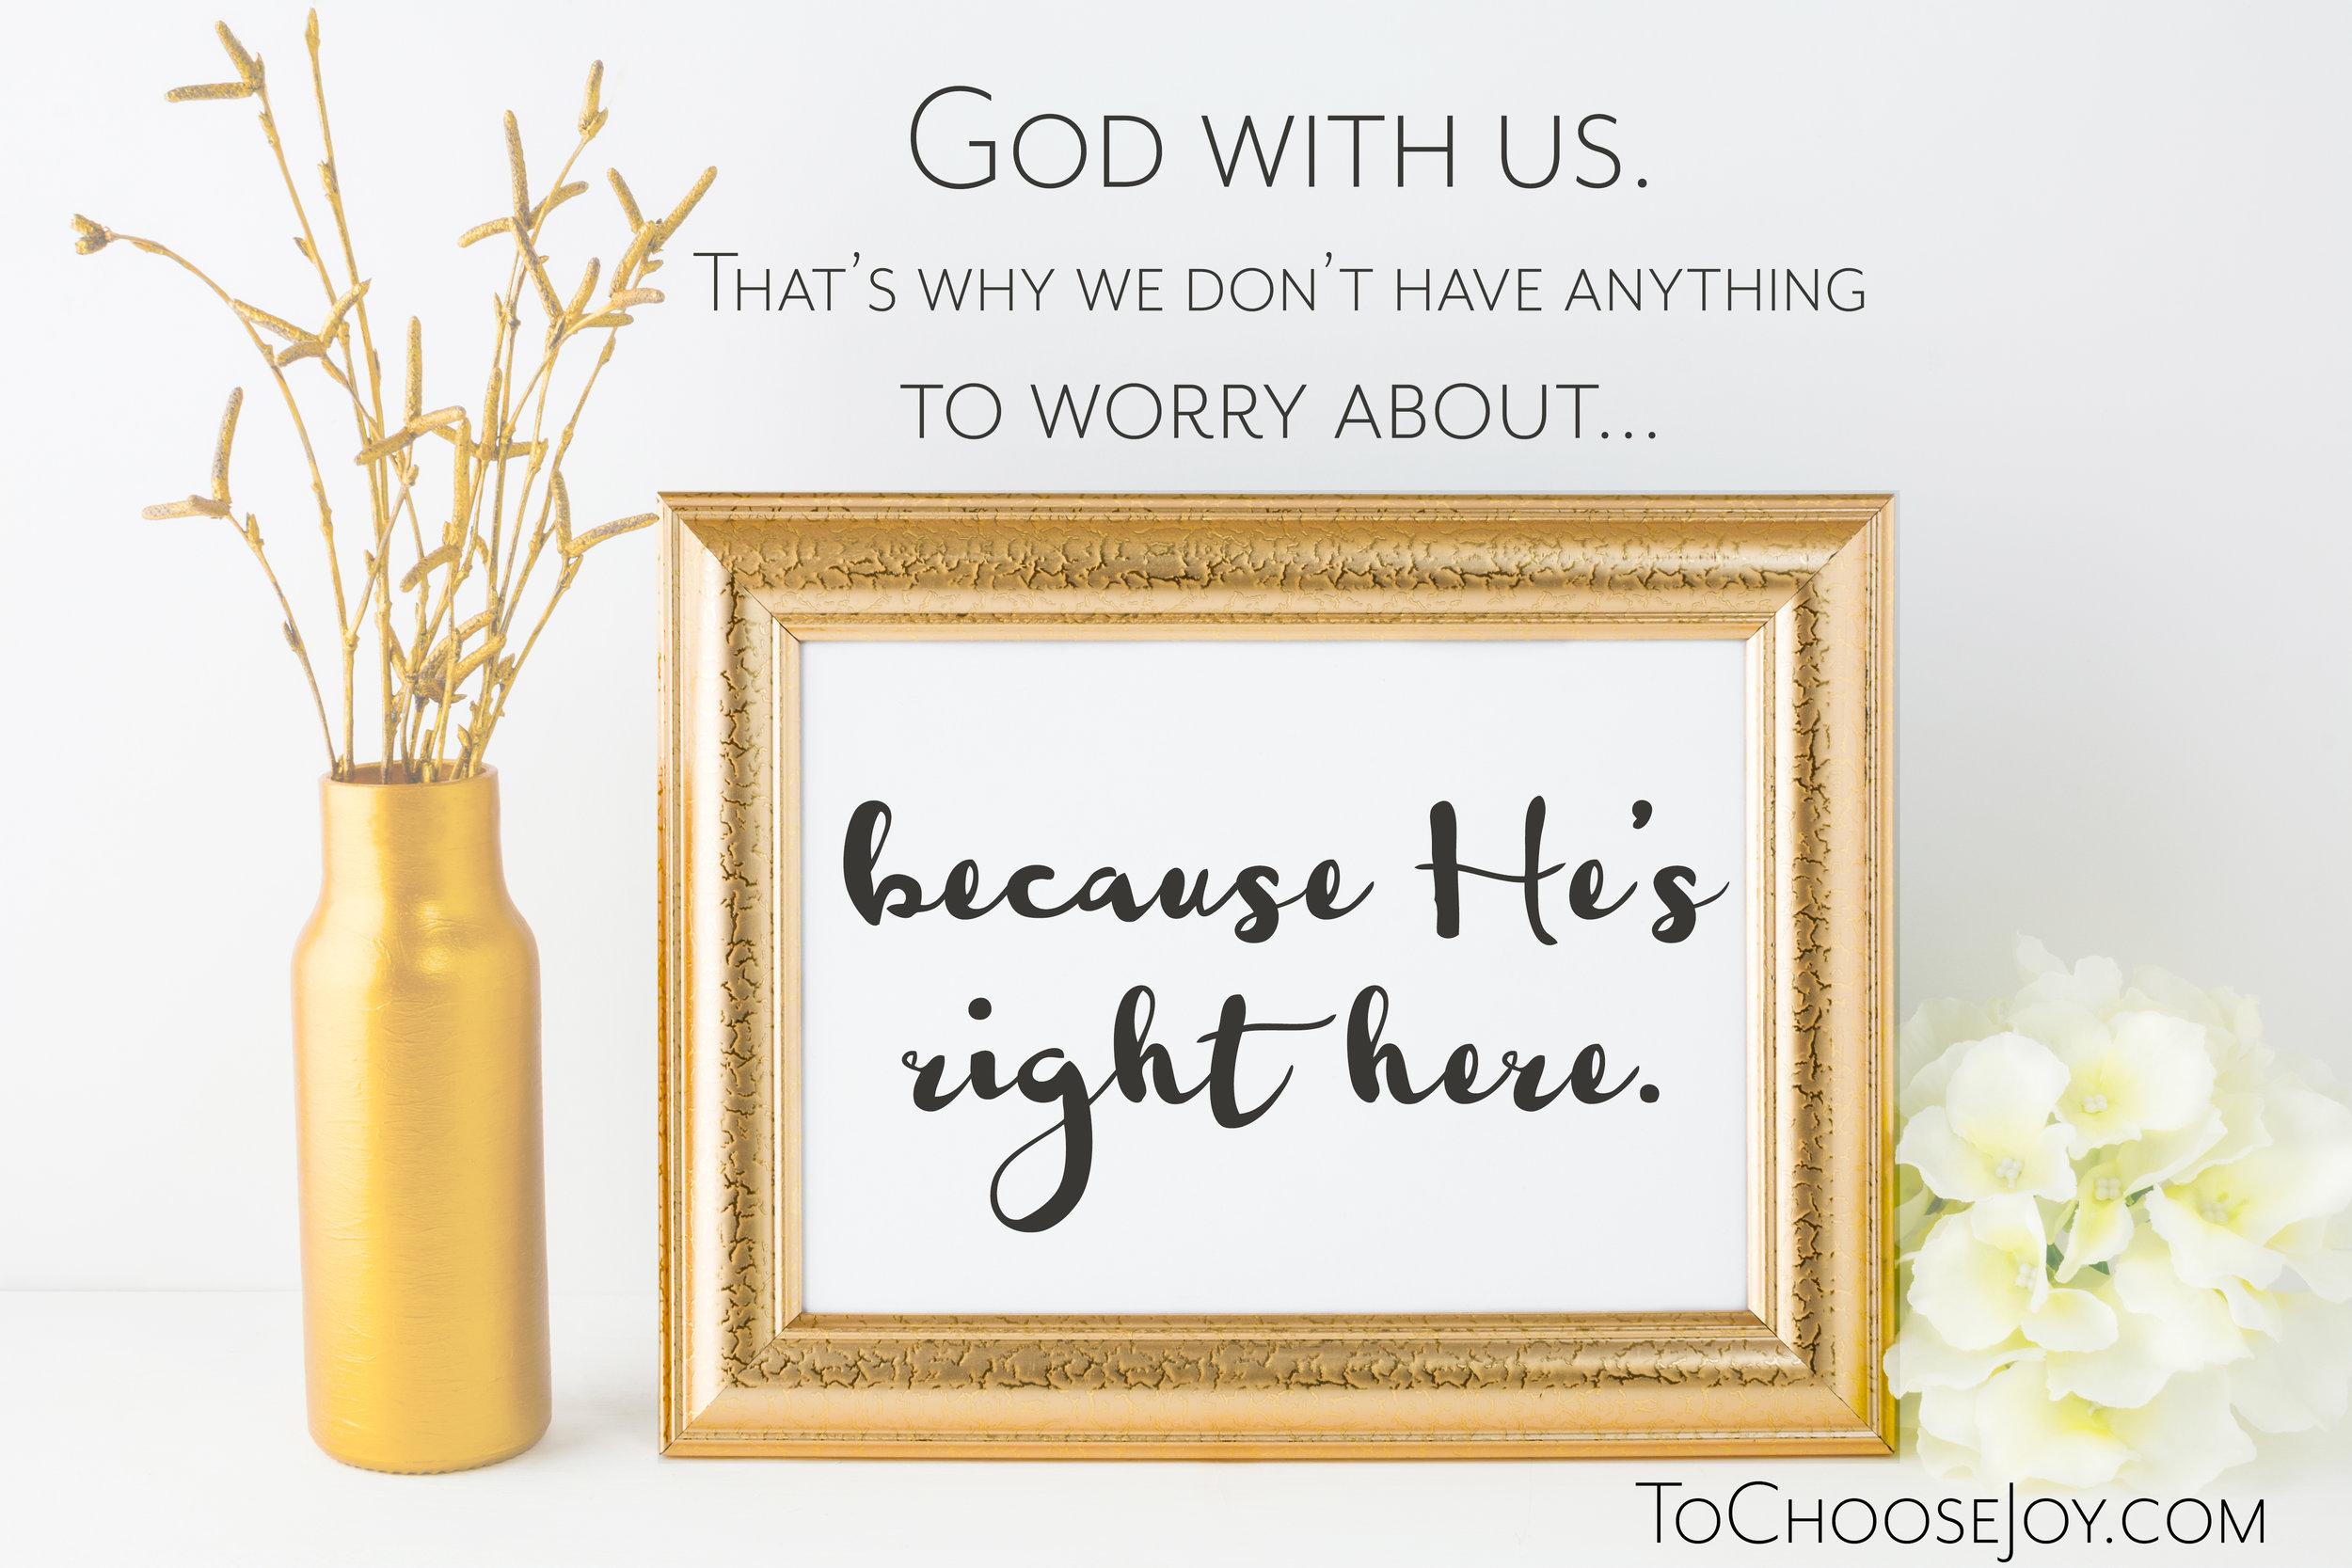 Emmanuel_God with Us_Advent_To Choose Joy